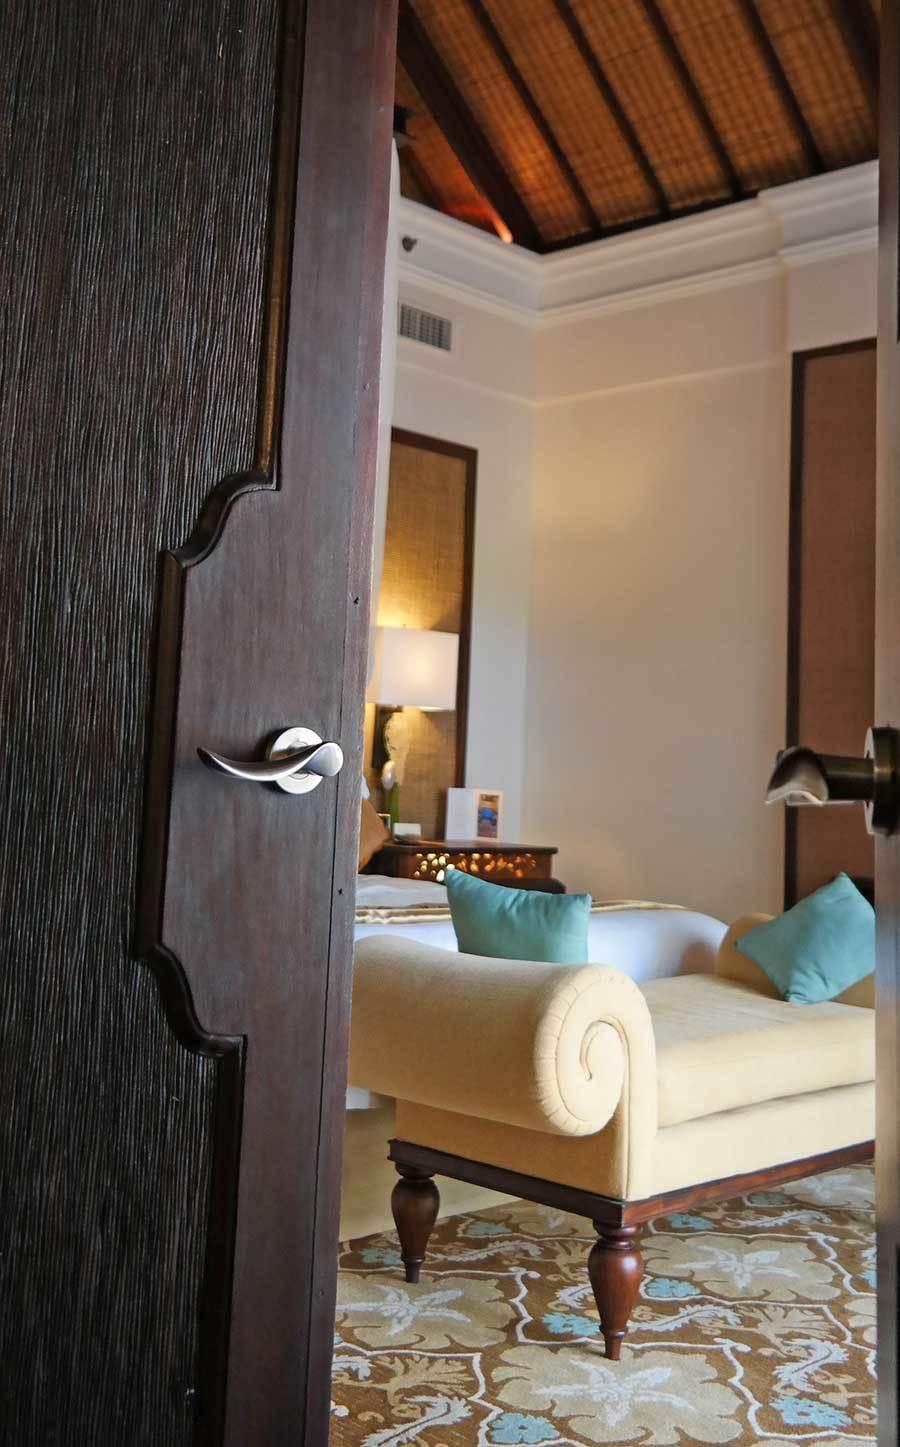 st-regis-bedroom-in-villa